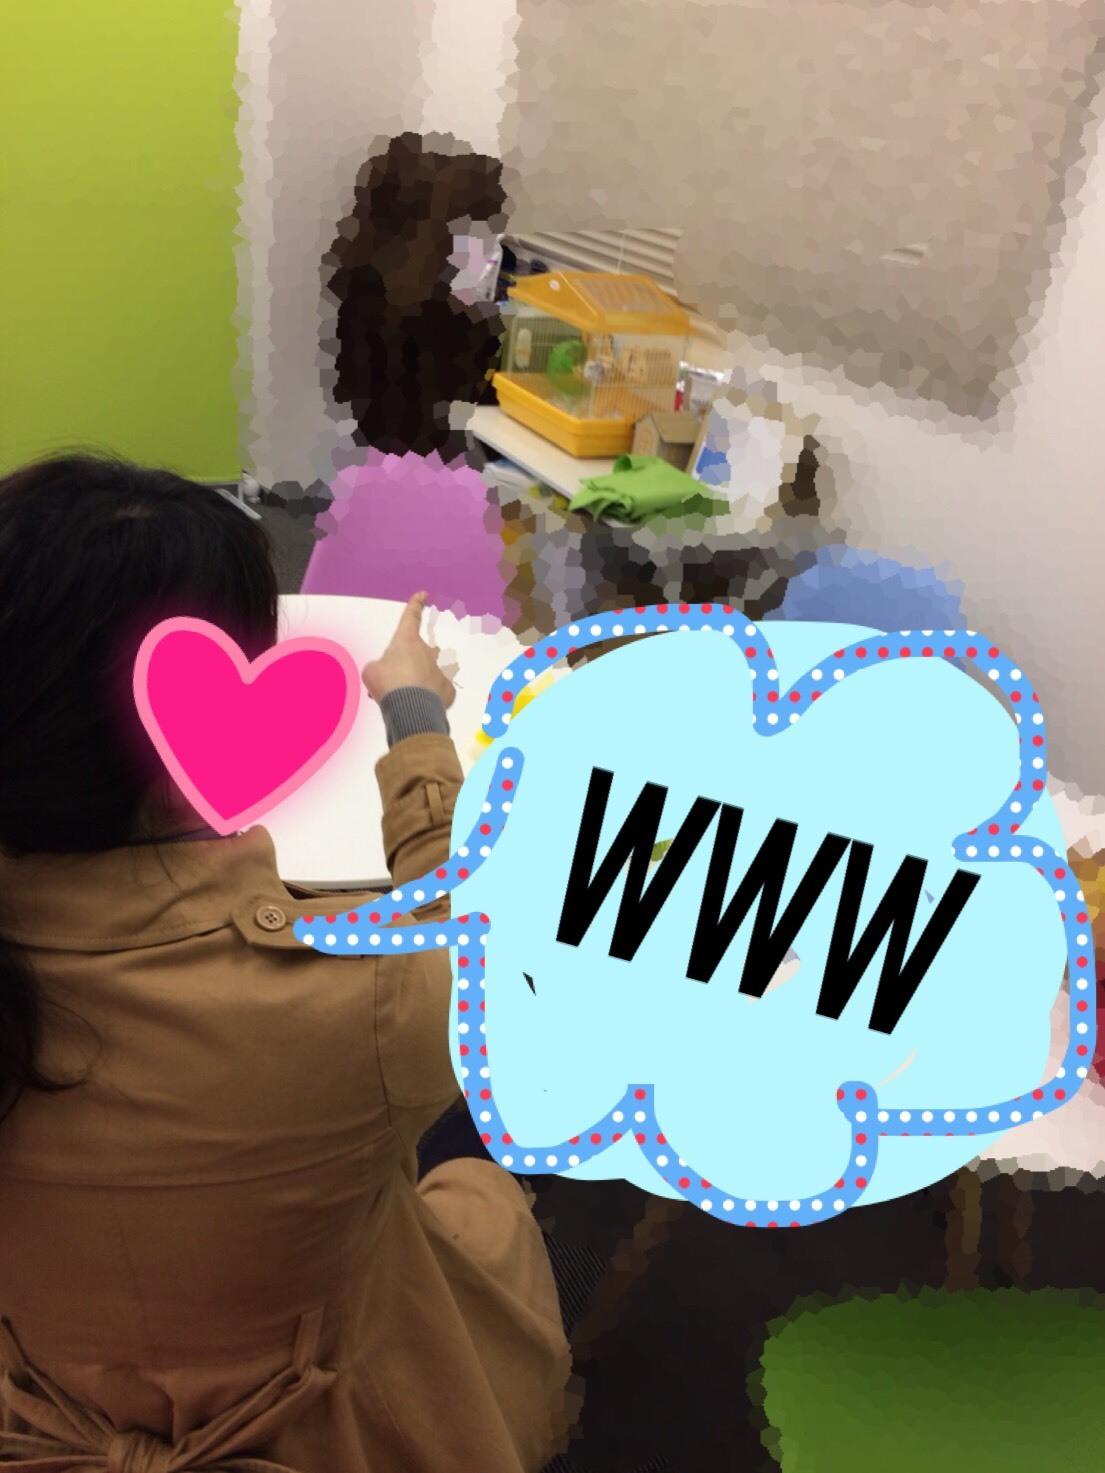 S__35659795.jpg